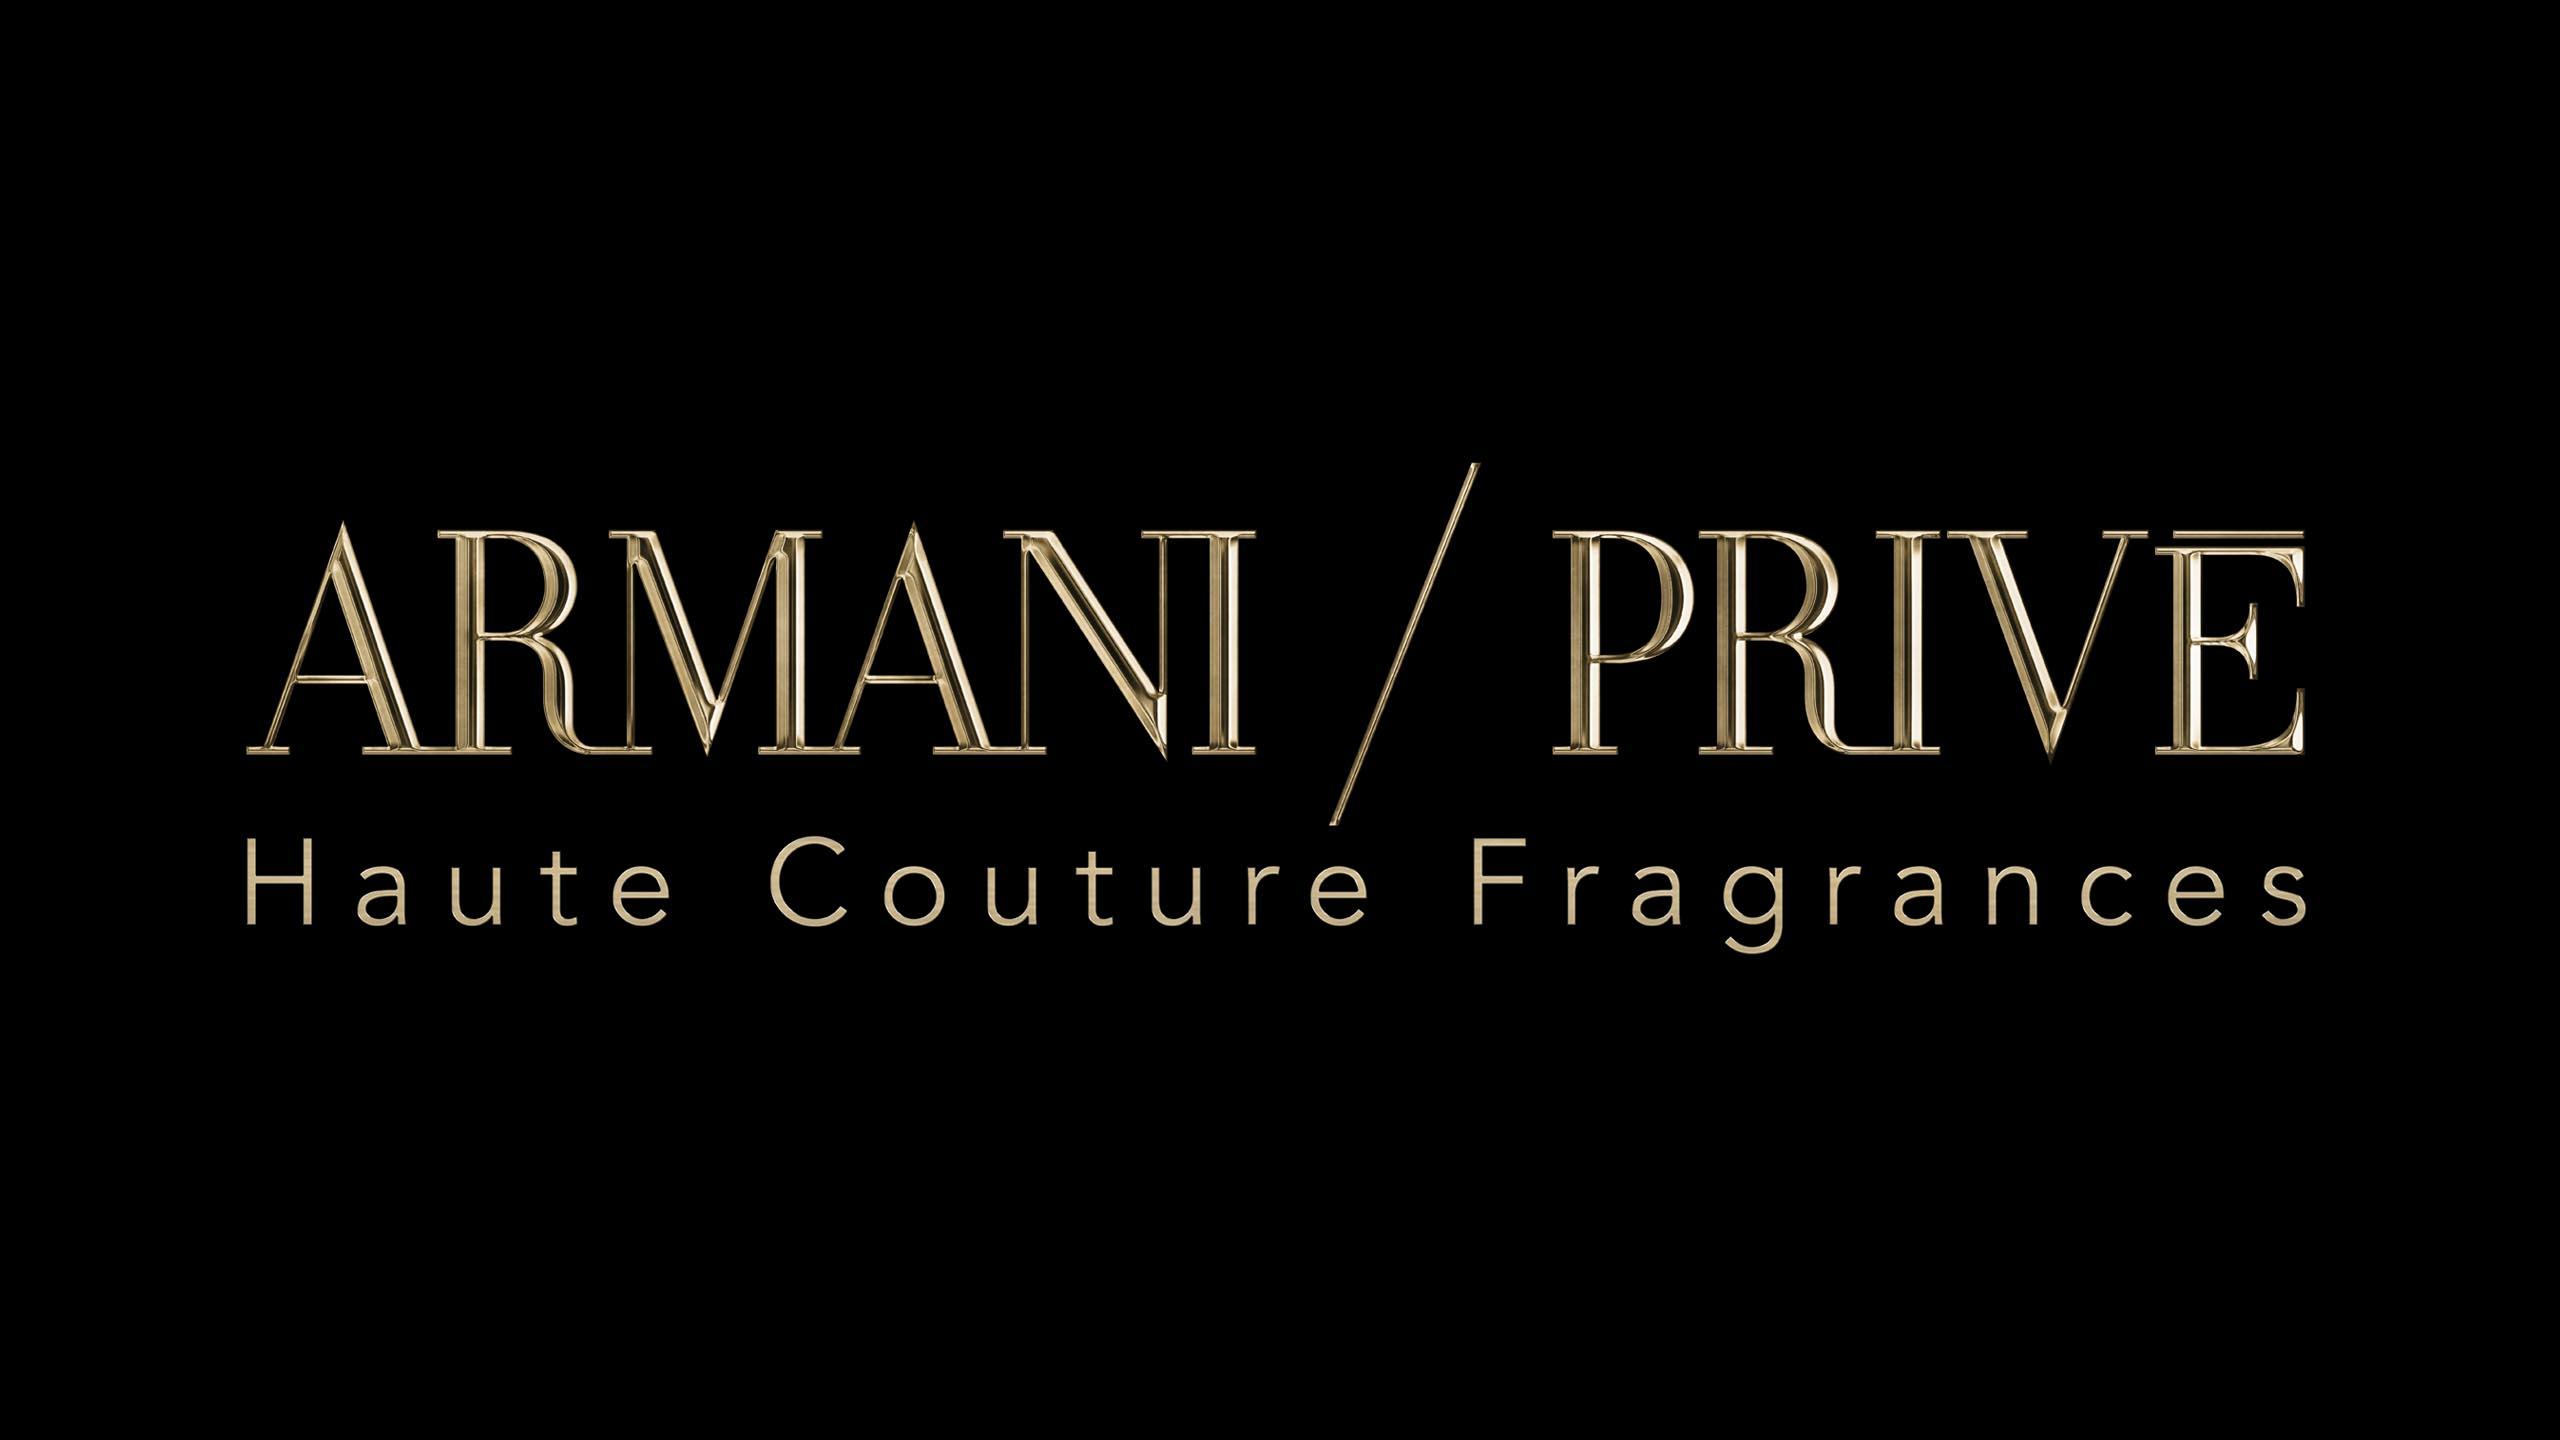 3D-logo for Armani Privé